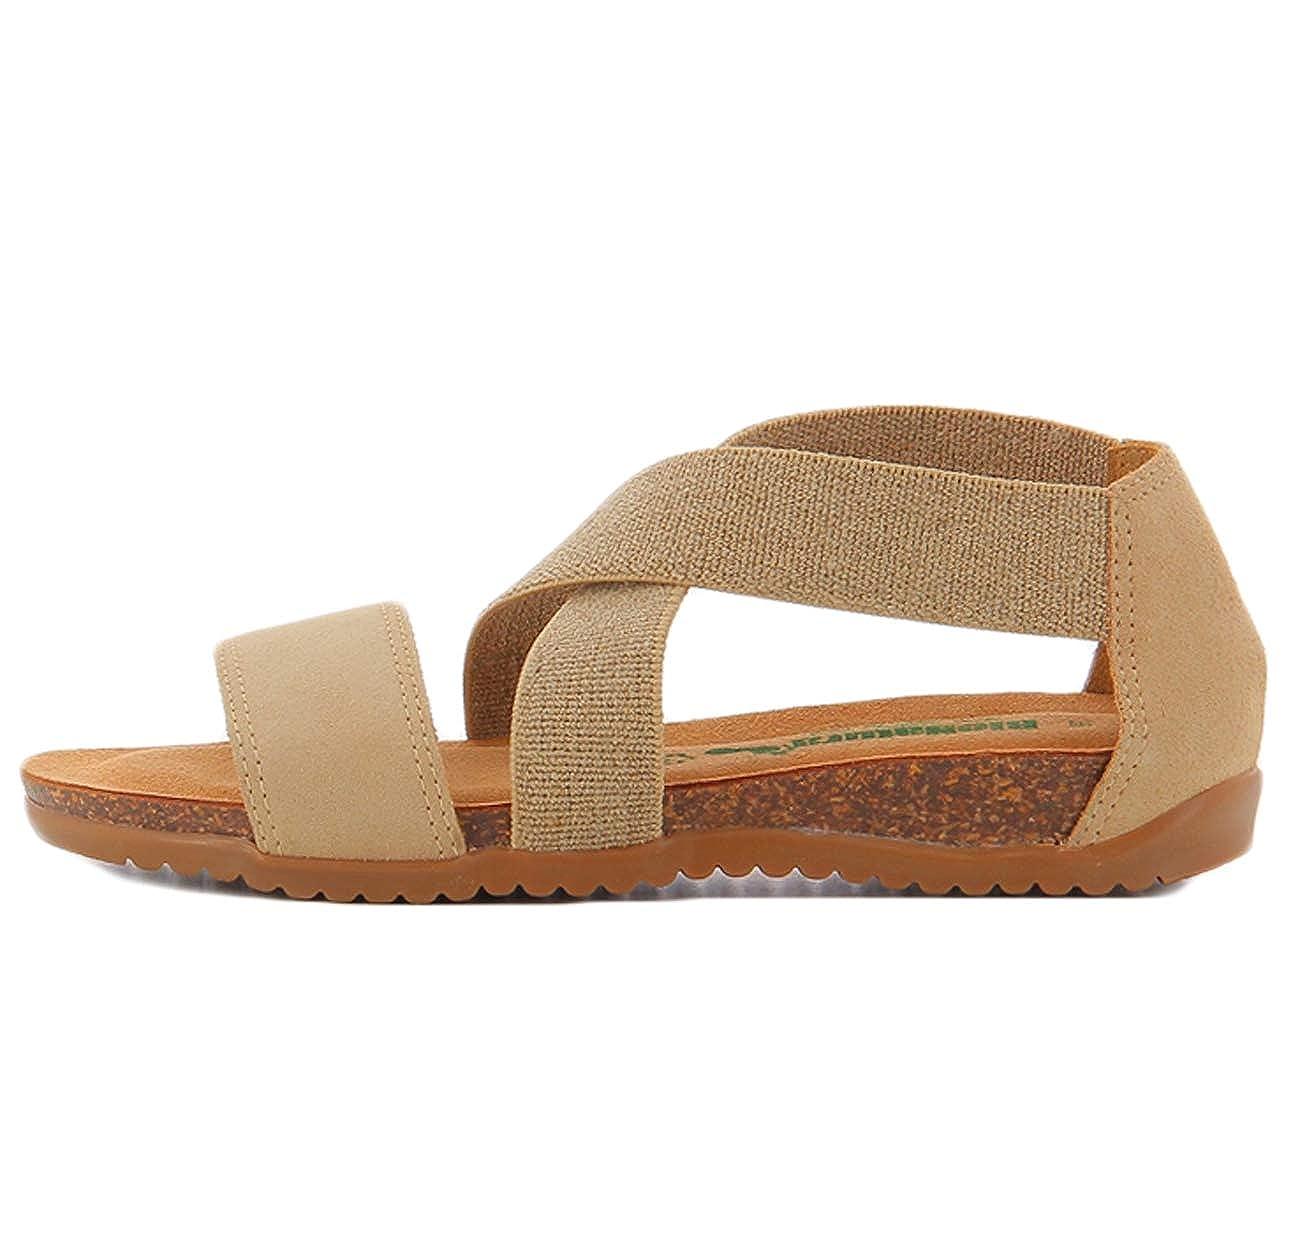 BioNatura Sandalo 34 A 825 Beige Beige Beige d0a91b